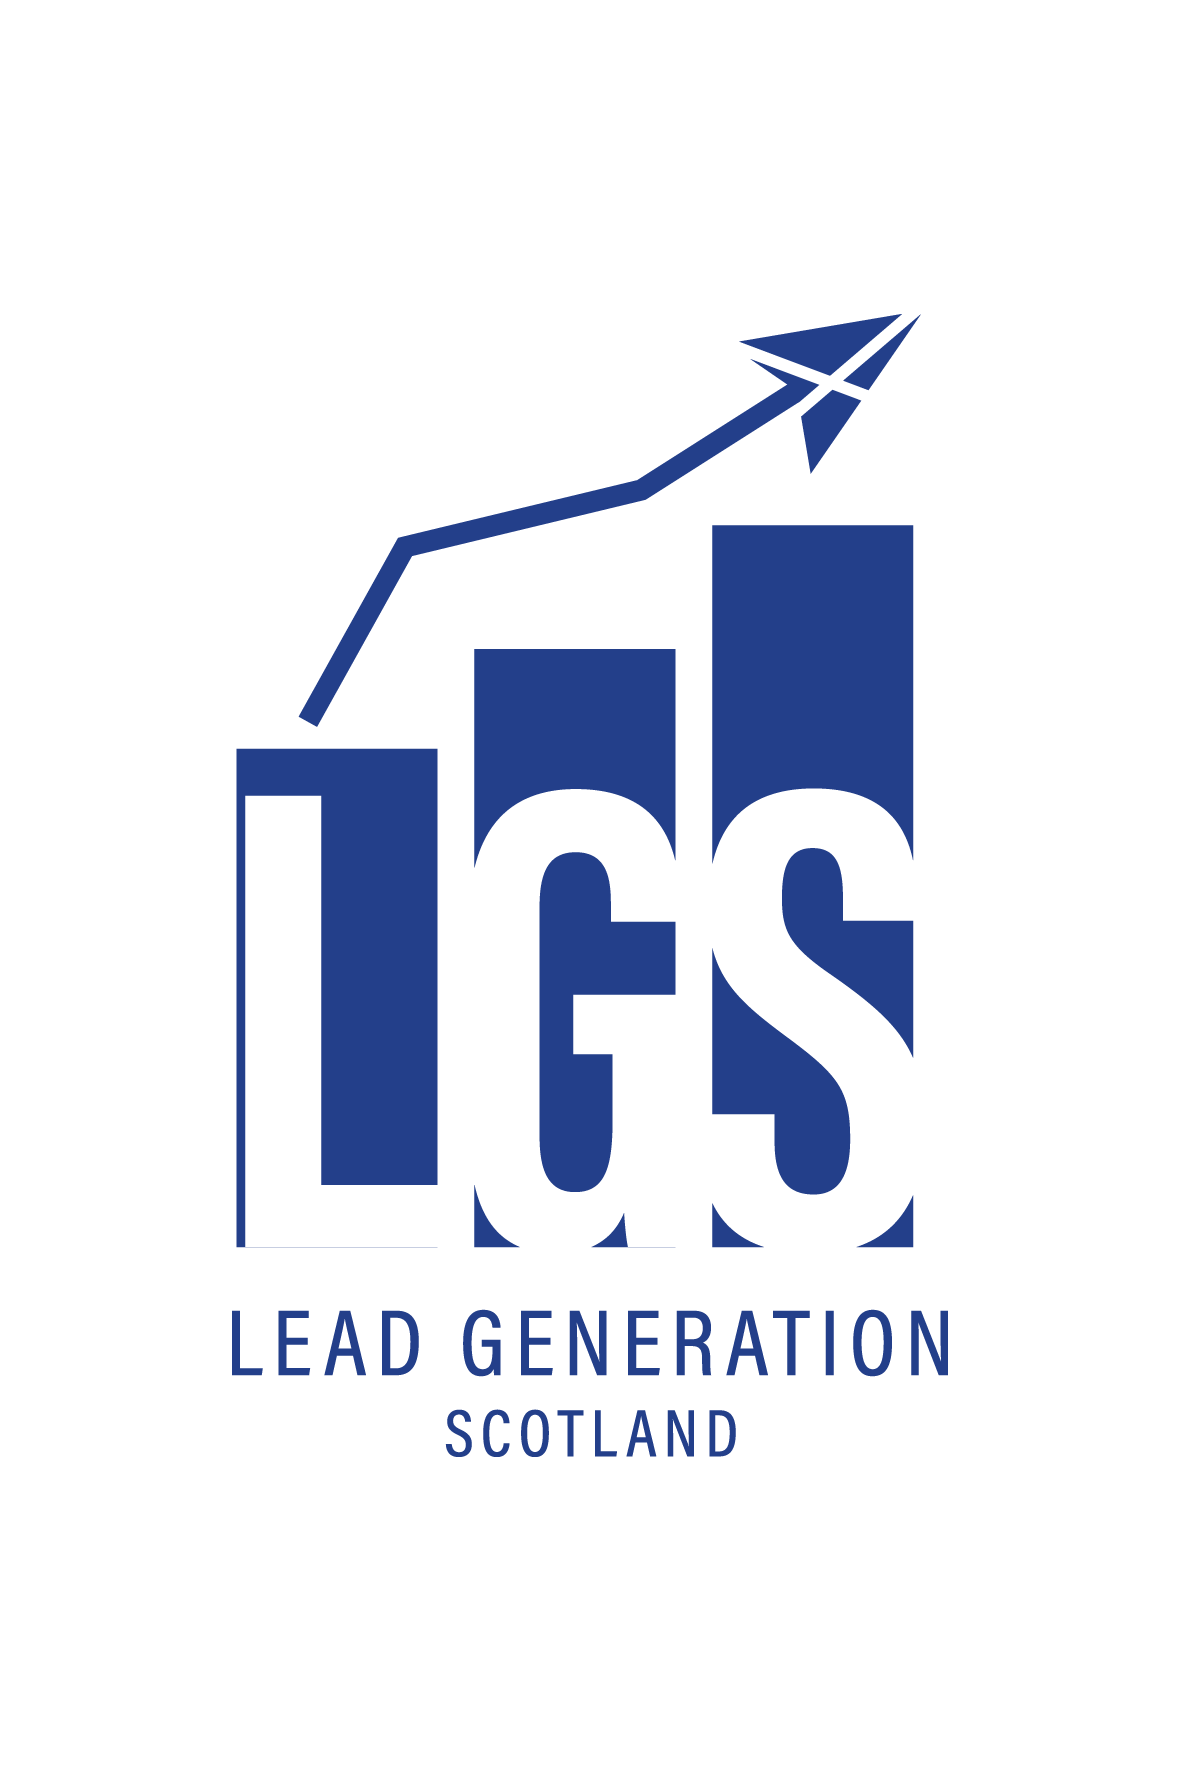 Lead Generation Scotland Ltd